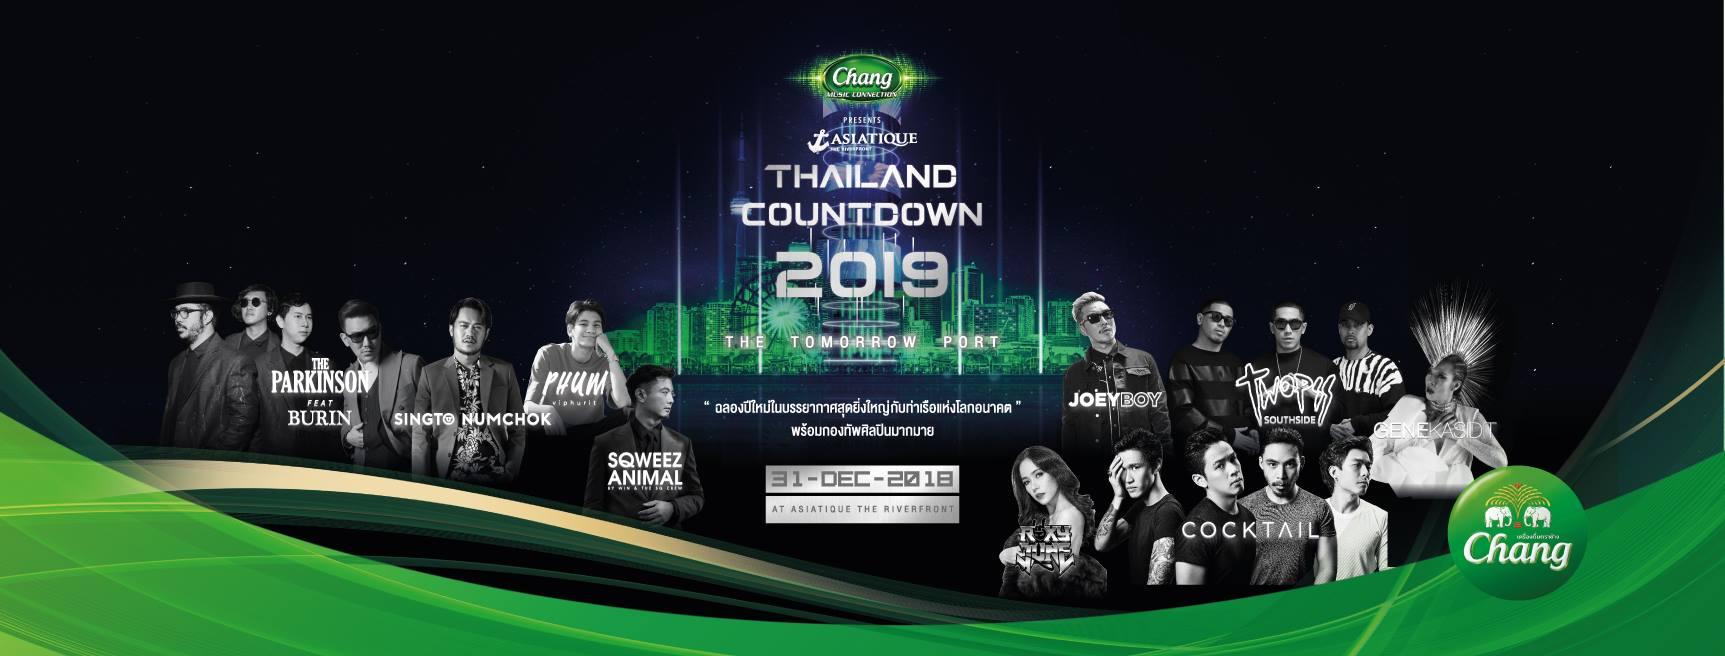 Asiatique Thailand countdown 2019 @Asiatique The Riverfront (เอเชียทีค เดอะ ริเวอร์ฟร้อนท์)